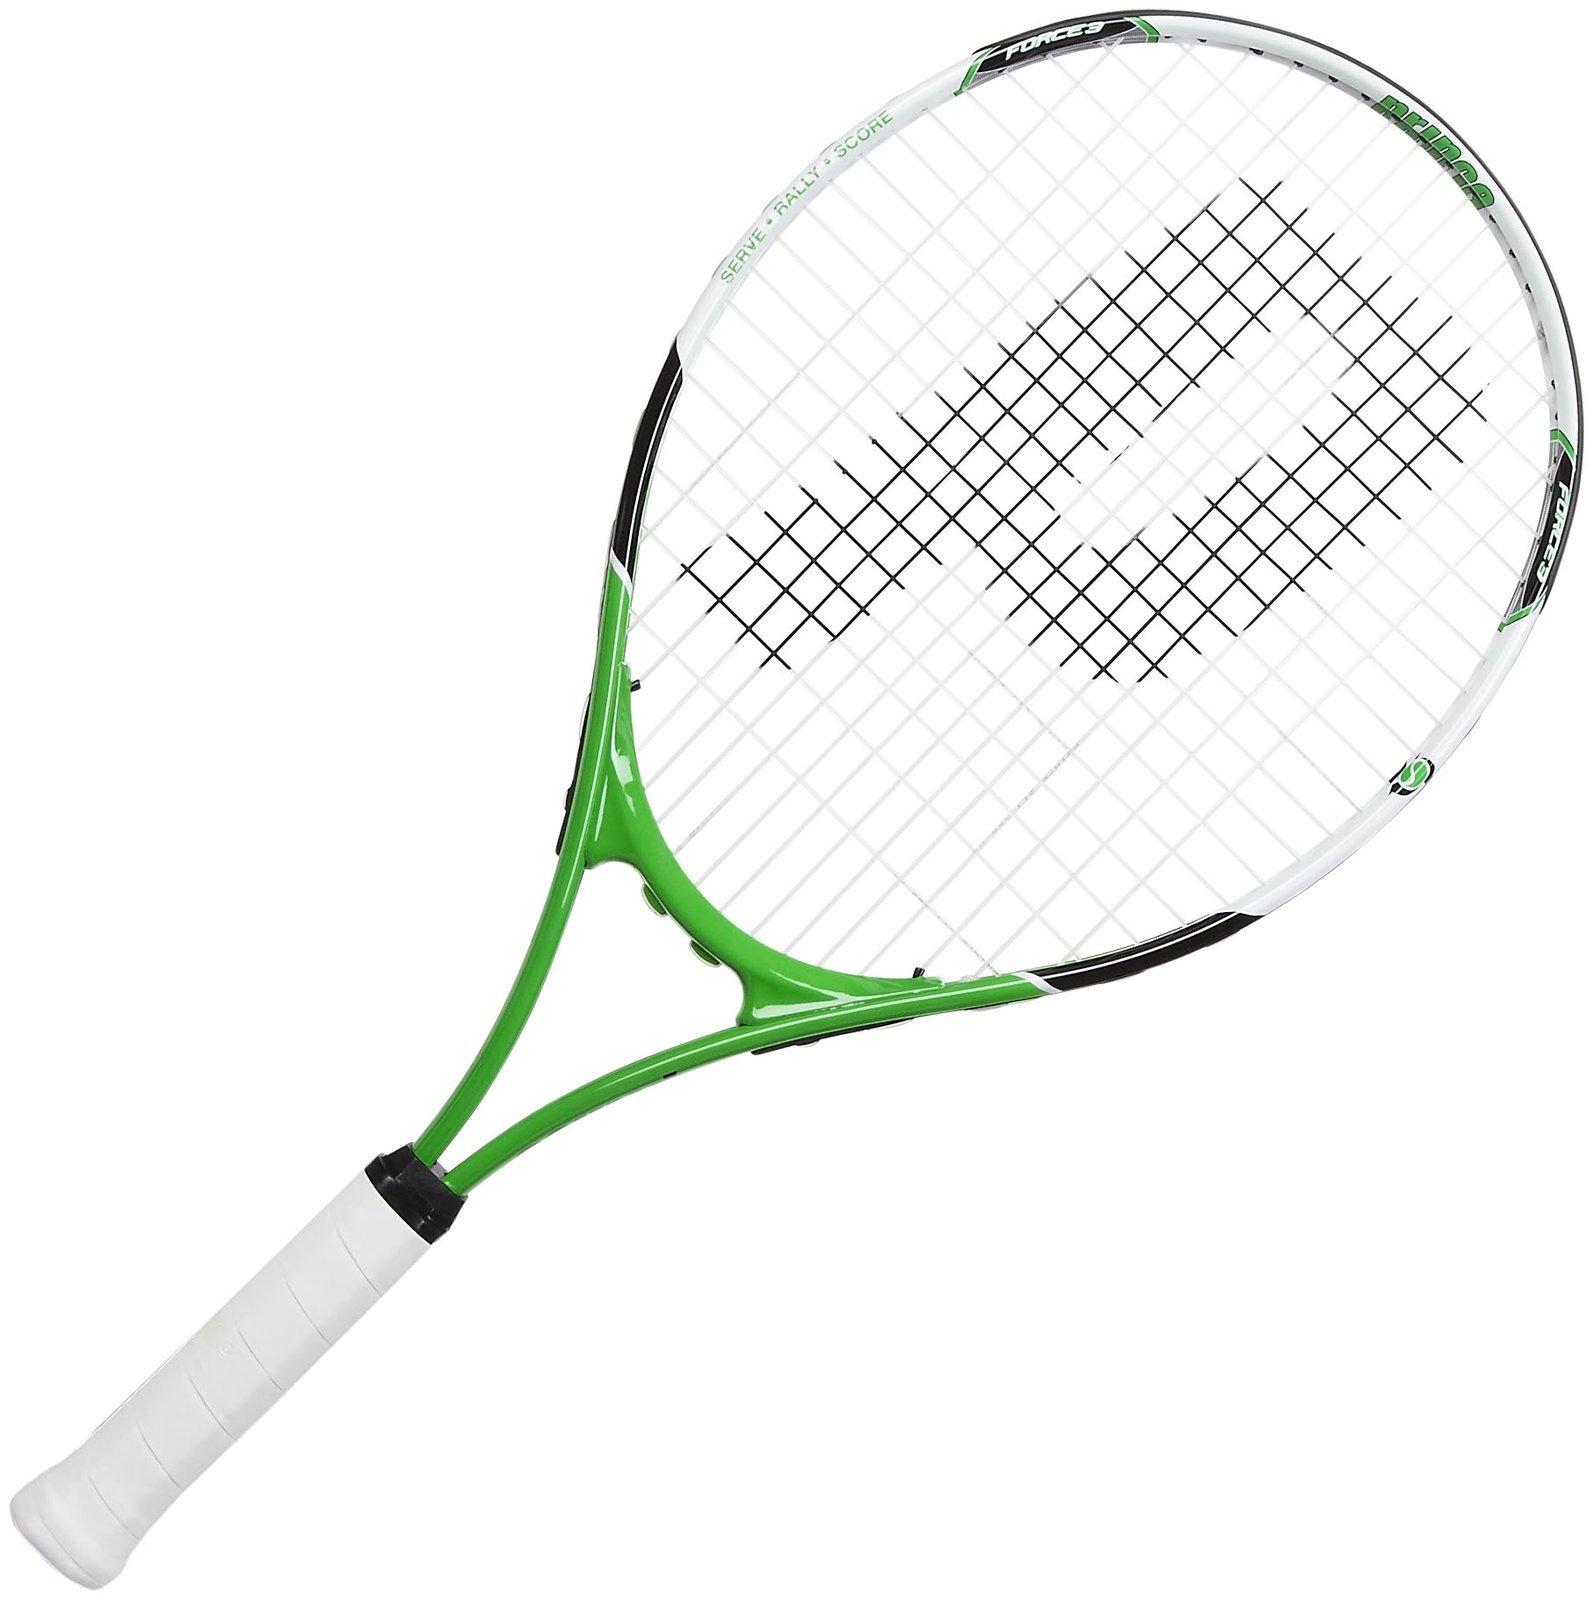 Prince 2013 Junior Play & Stay Tennis Racquet, 25 - Green/Black